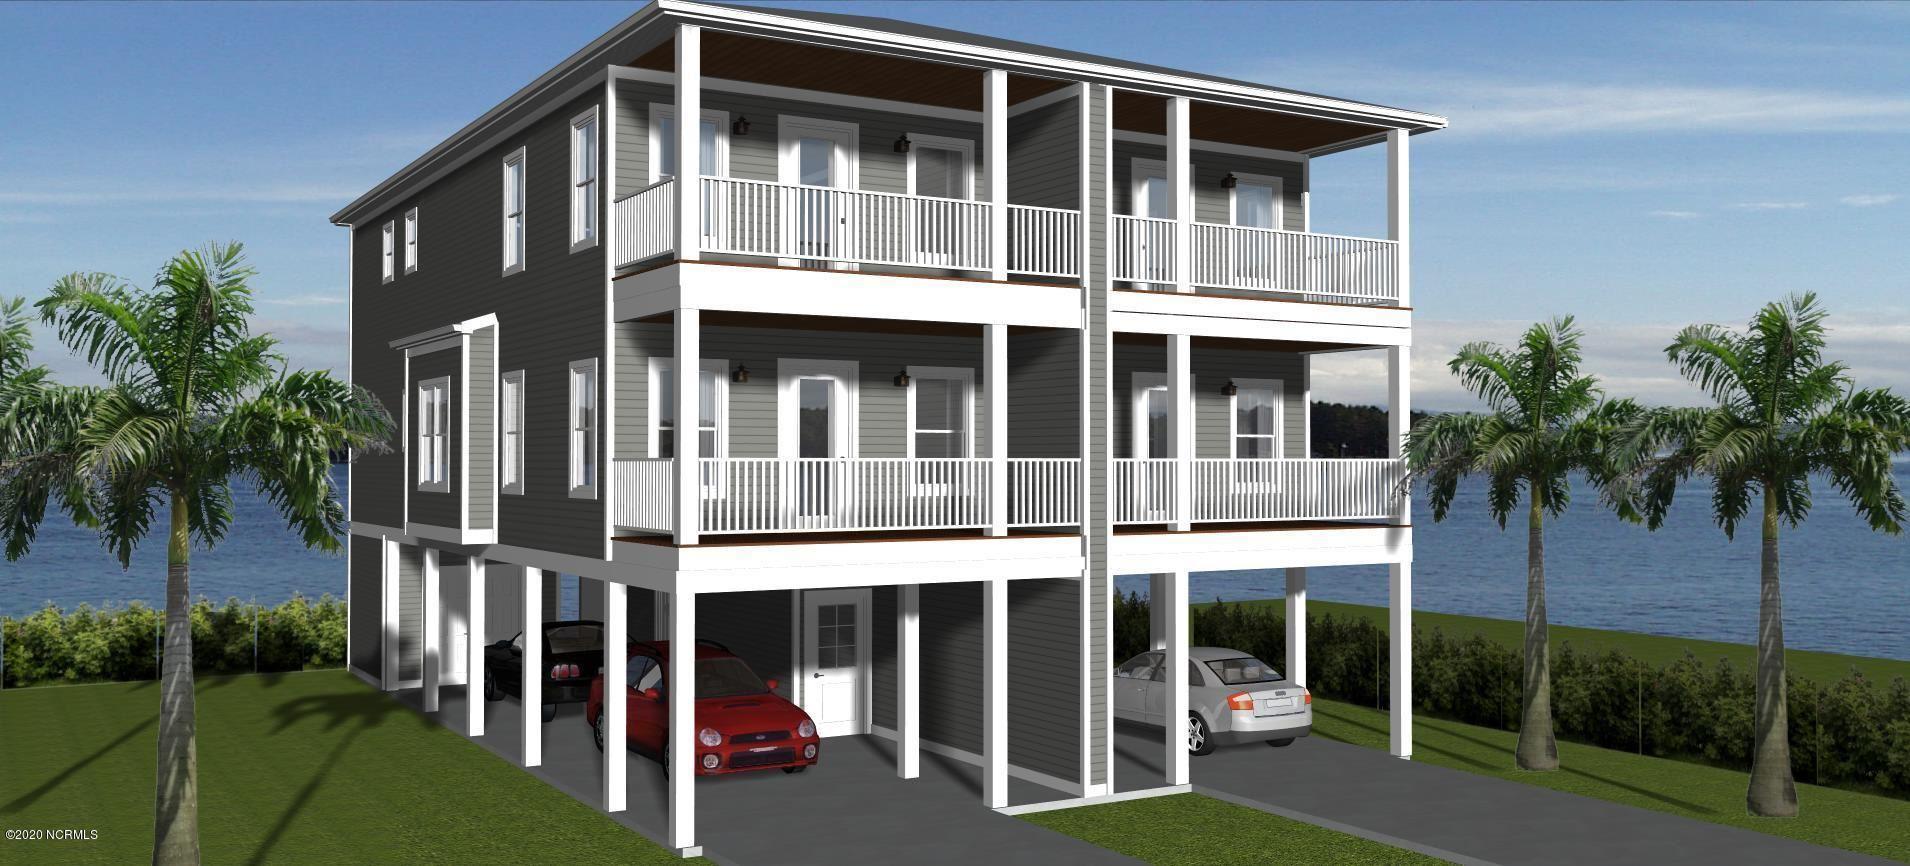 Photo of 1308 Mackerel Lane #2, Carolina Beach, NC 28428 (MLS # 100267606)